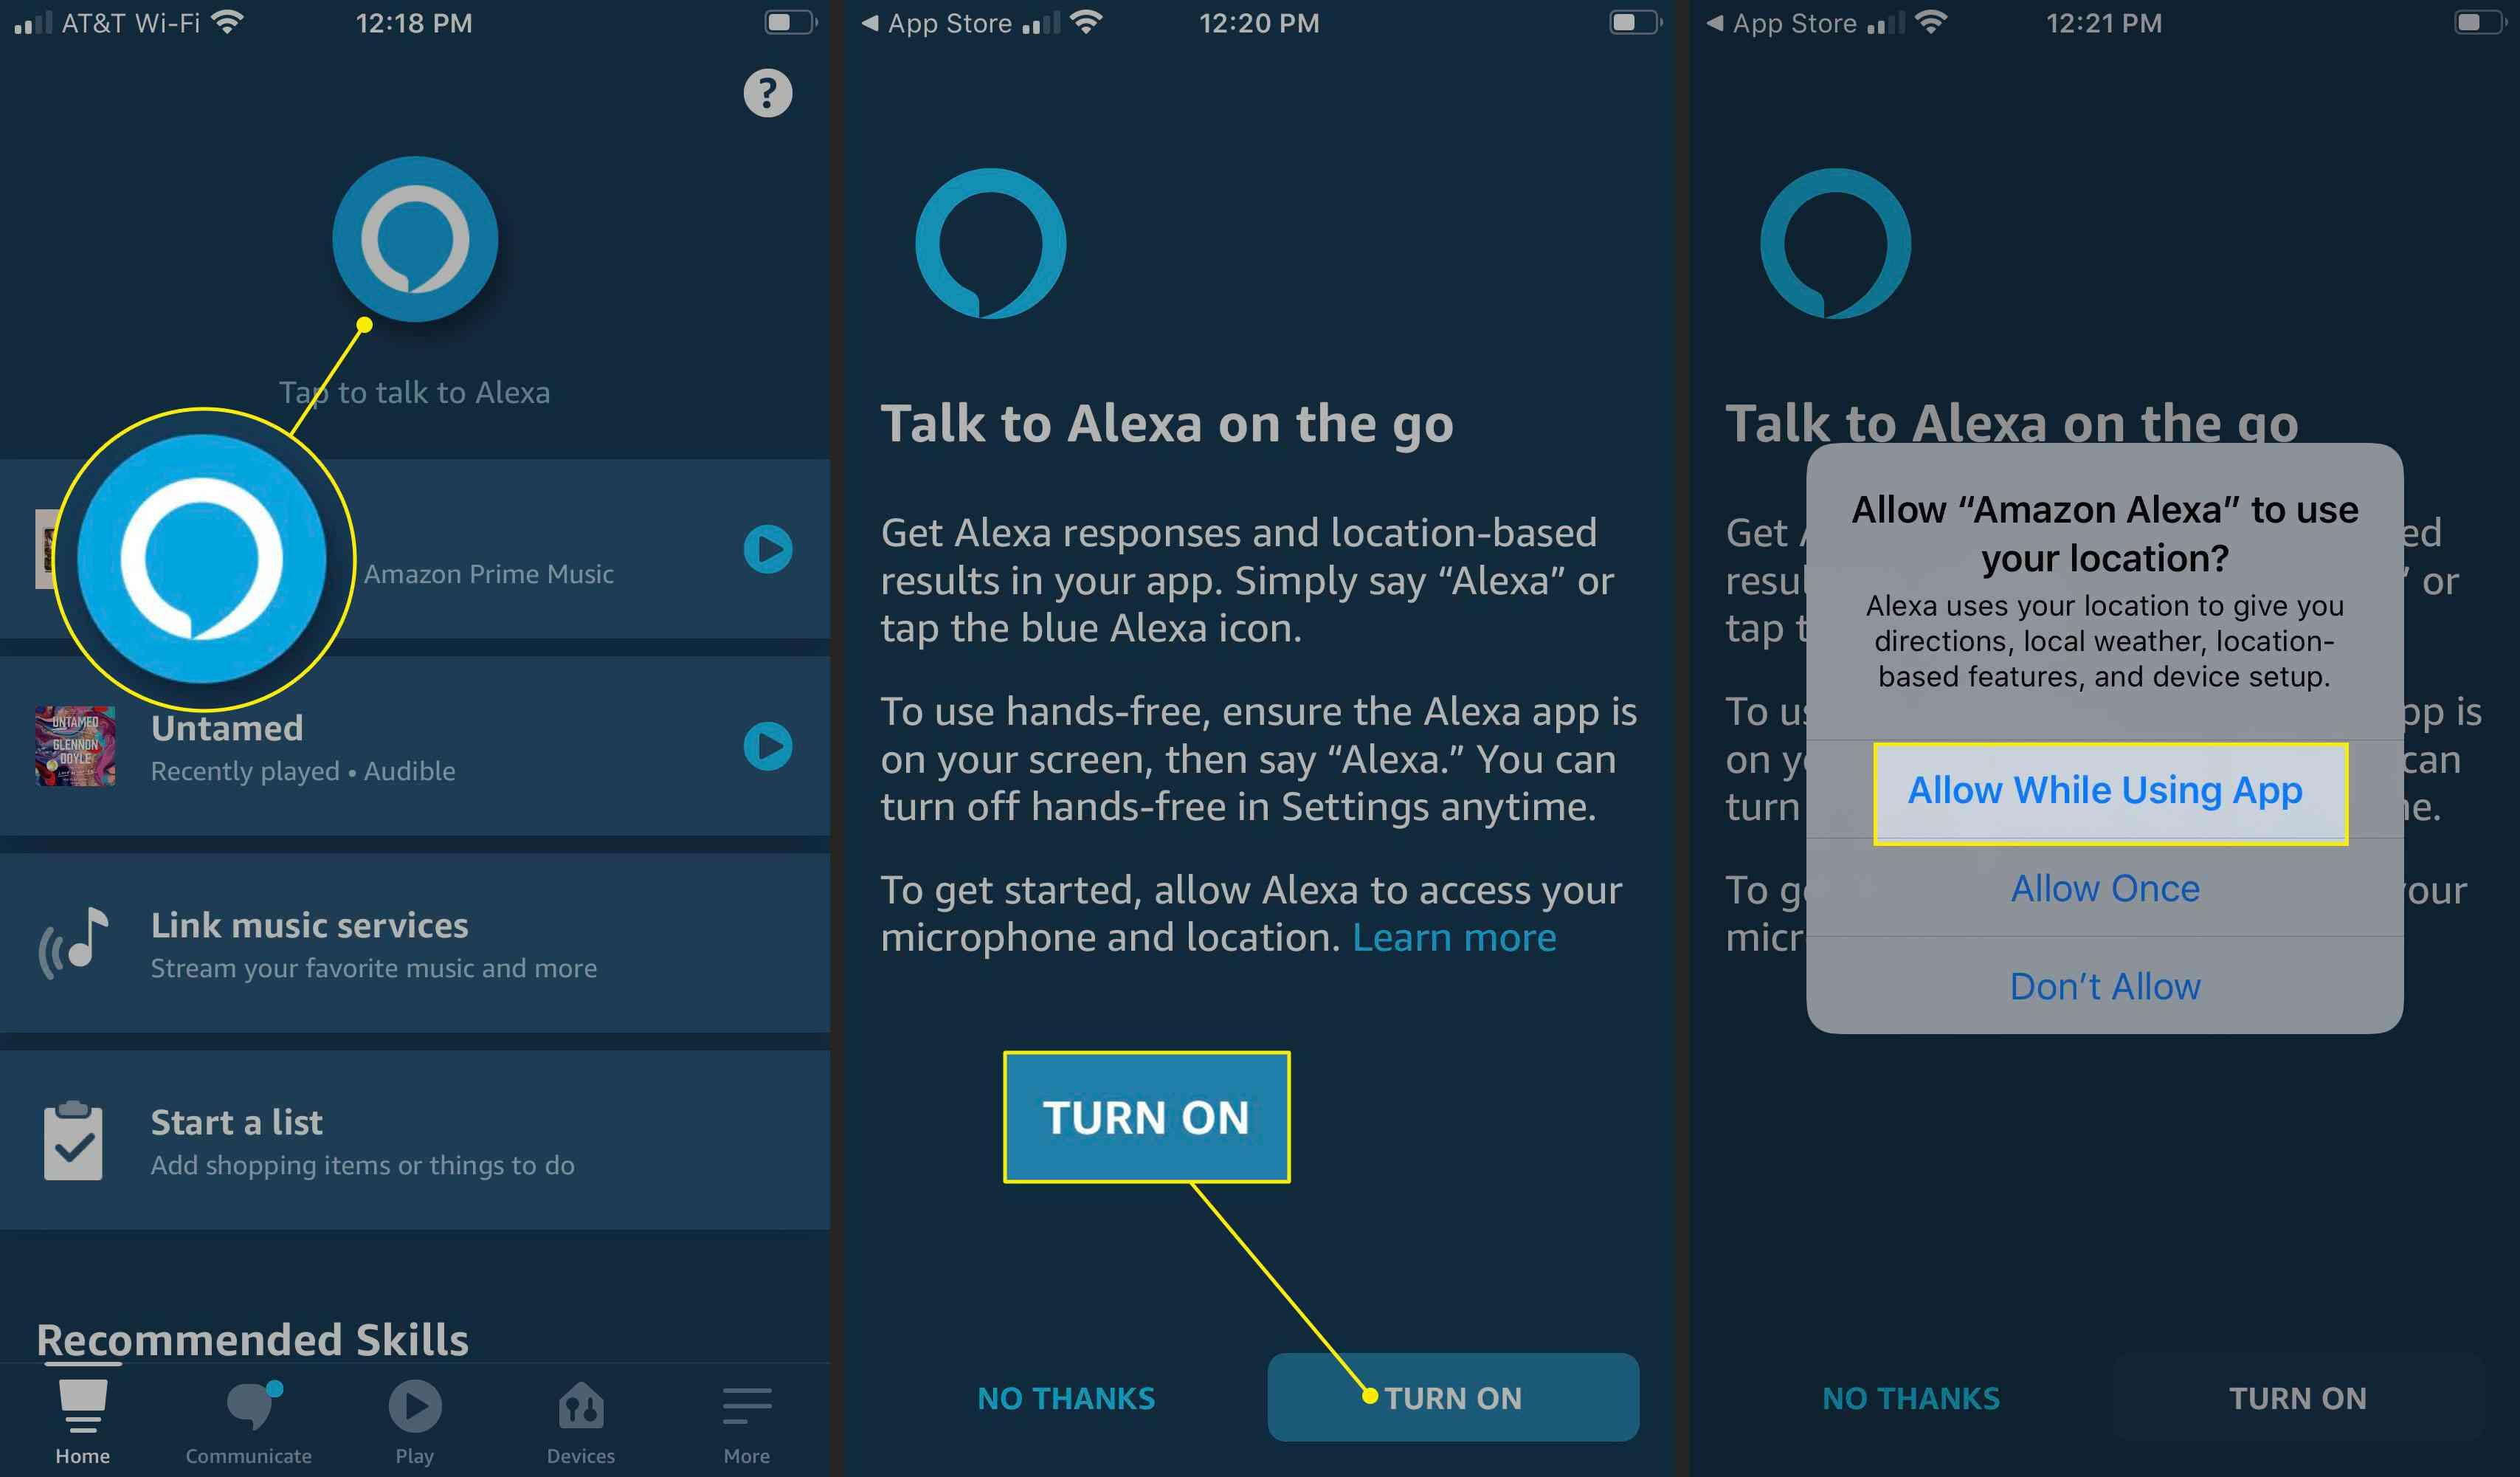 Turn on Alexa in the app